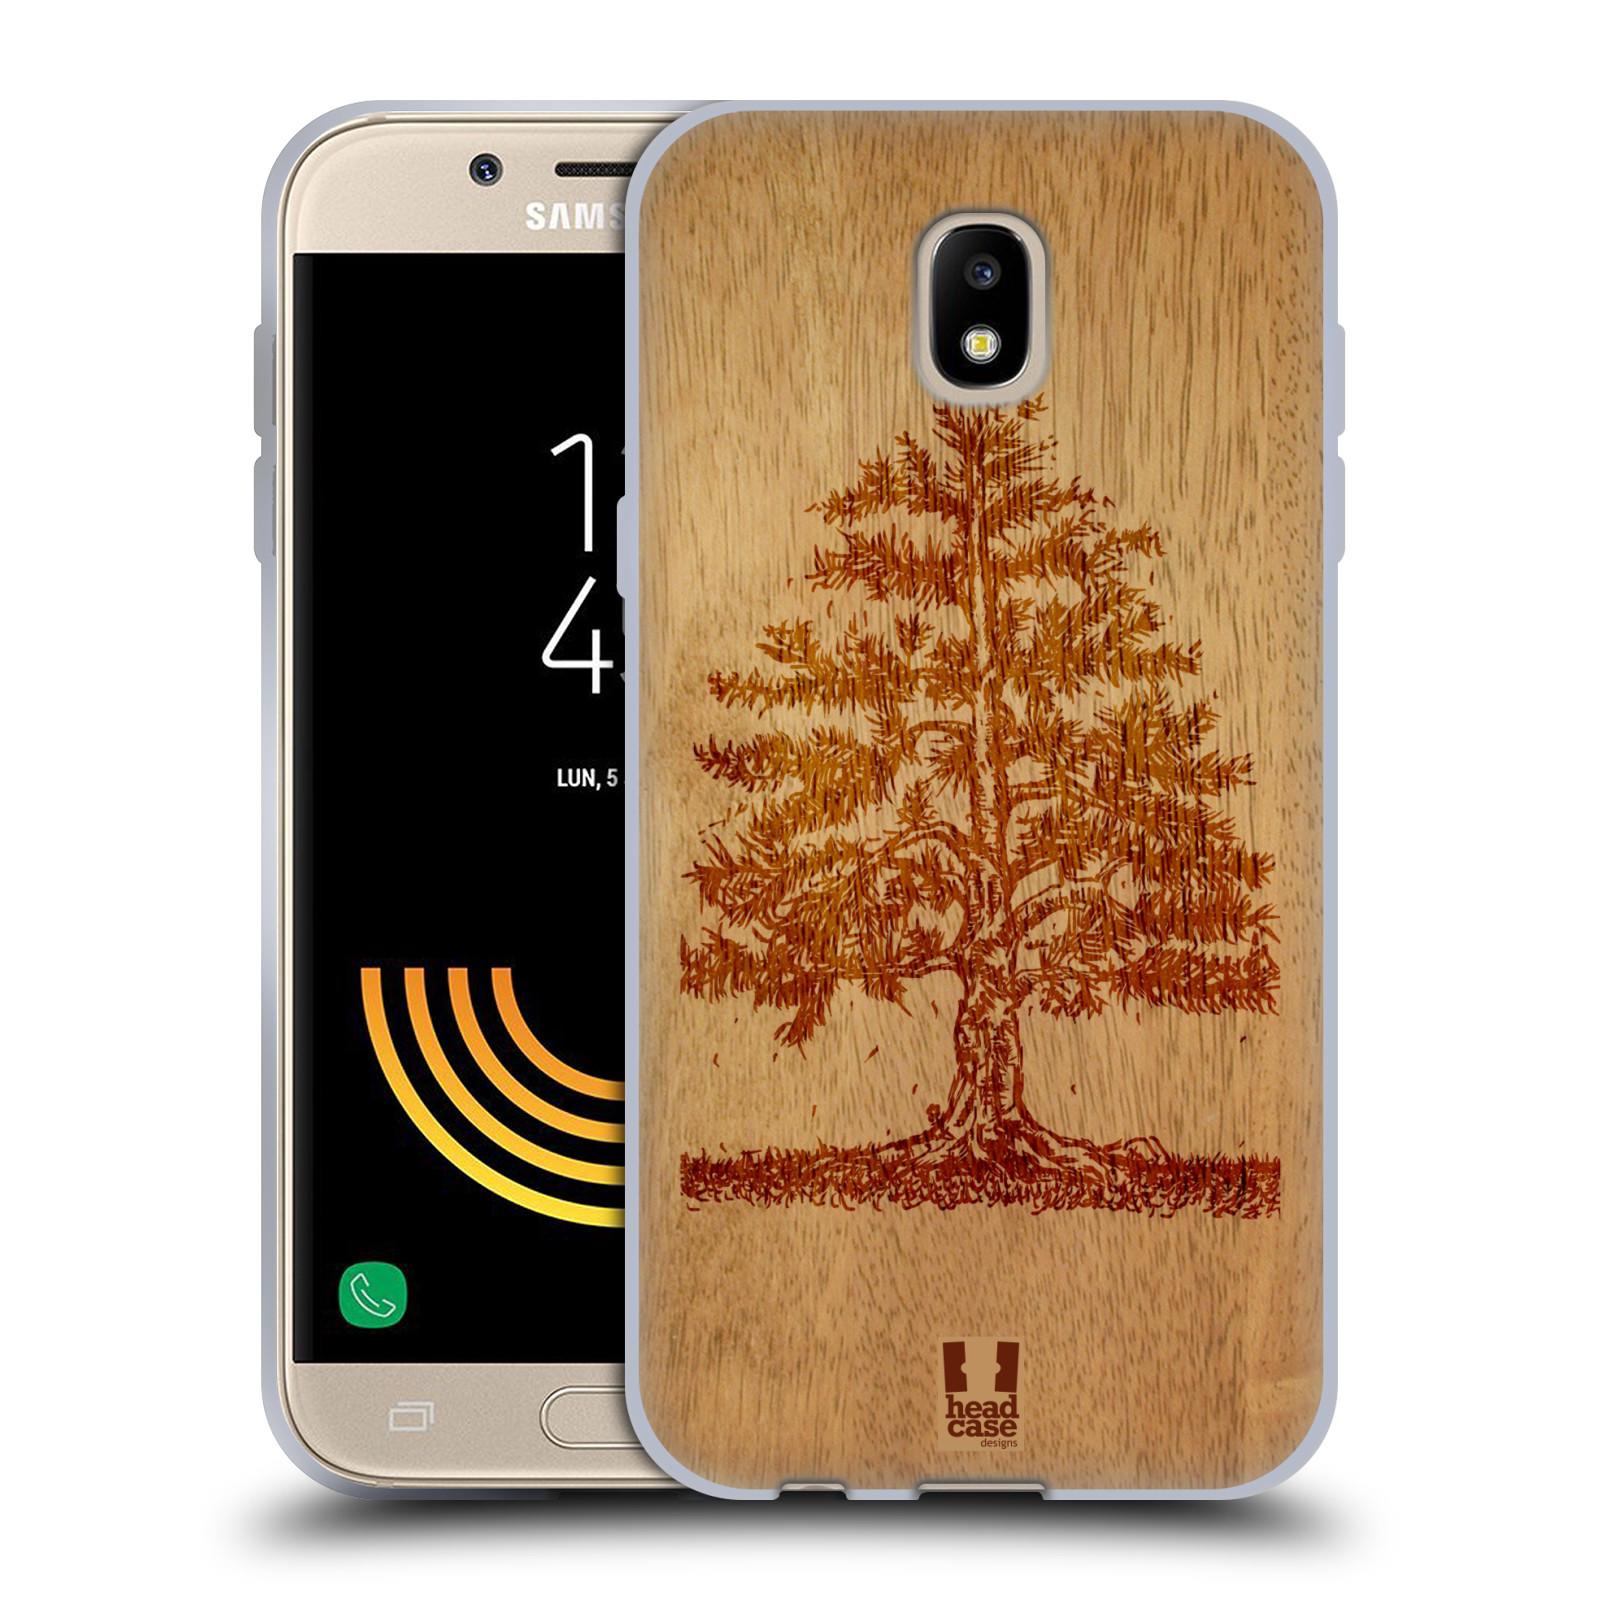 Silikonové pouzdro na mobil Samsung Galaxy J5 (2017) - Head Case - WOODART  TREE empty 7d73f7980a8